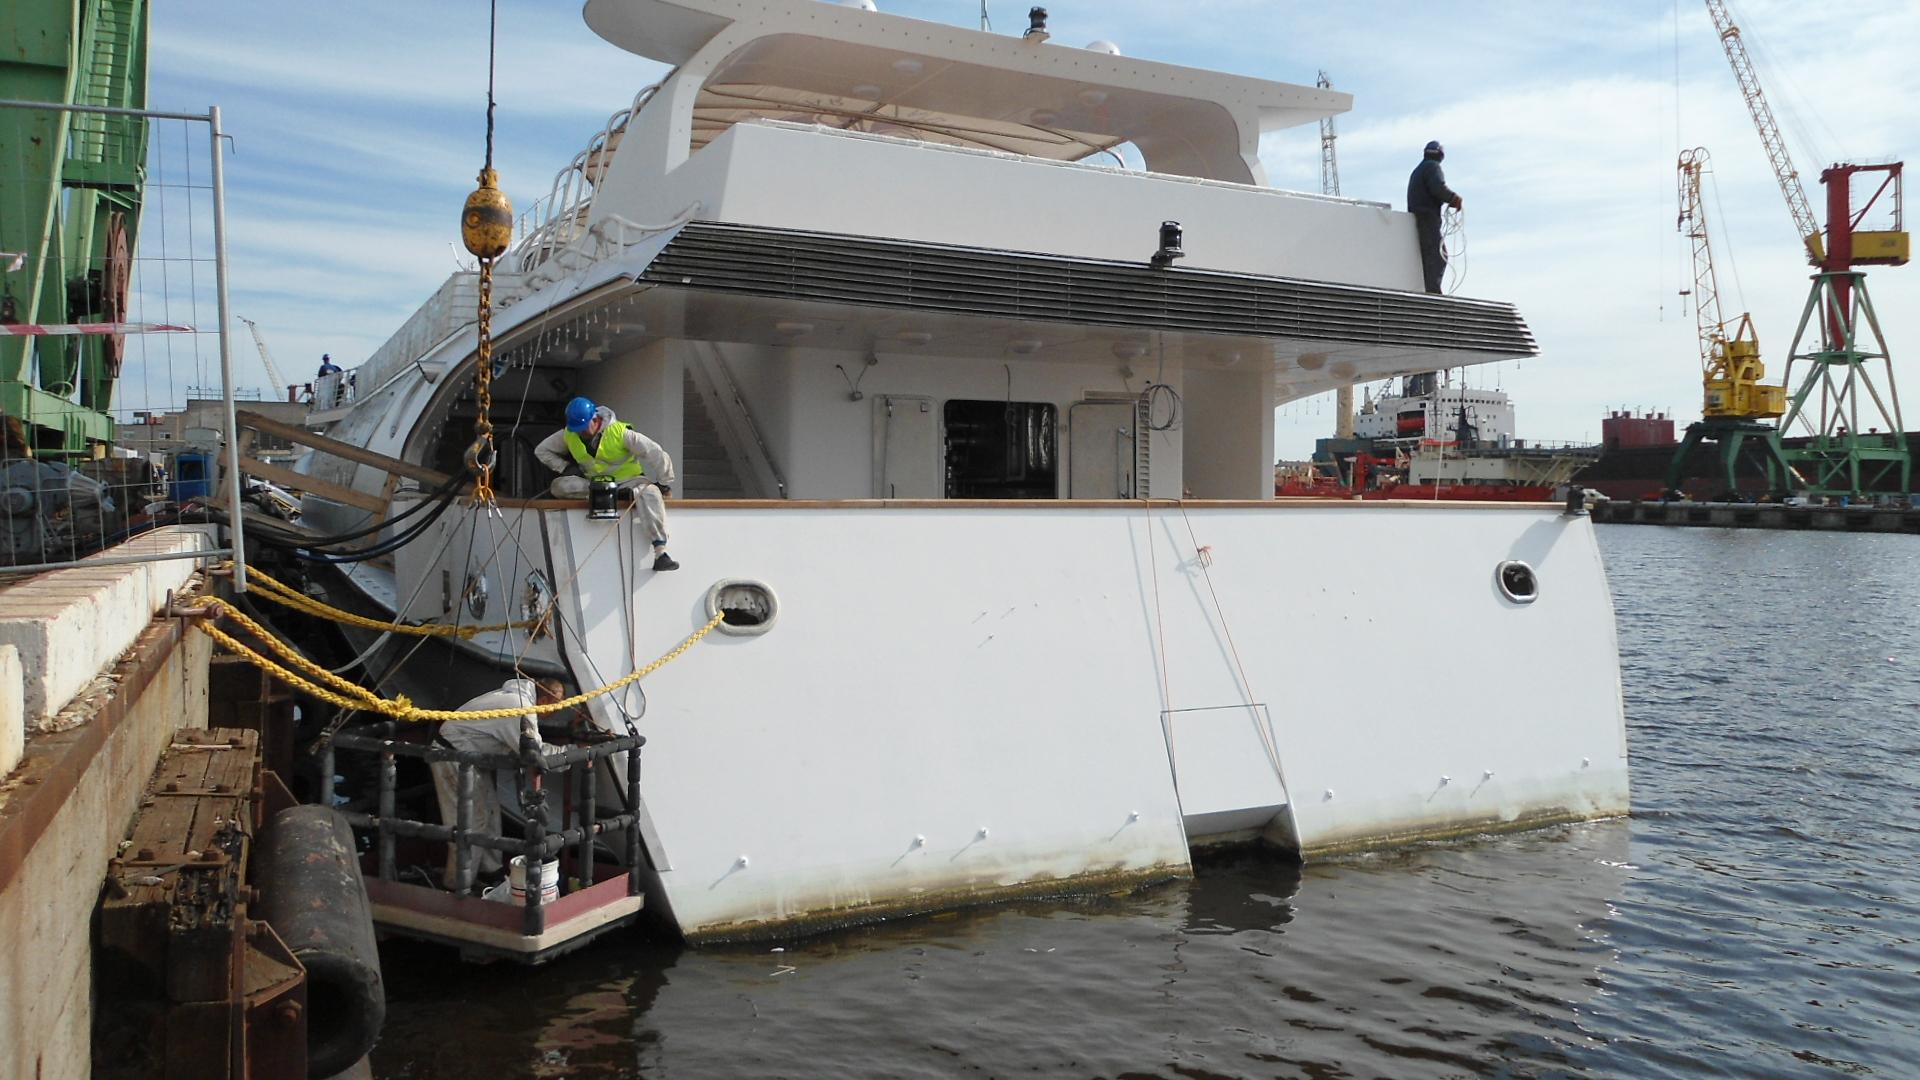 Radisson Royal Flotilla (Super-Yachts)